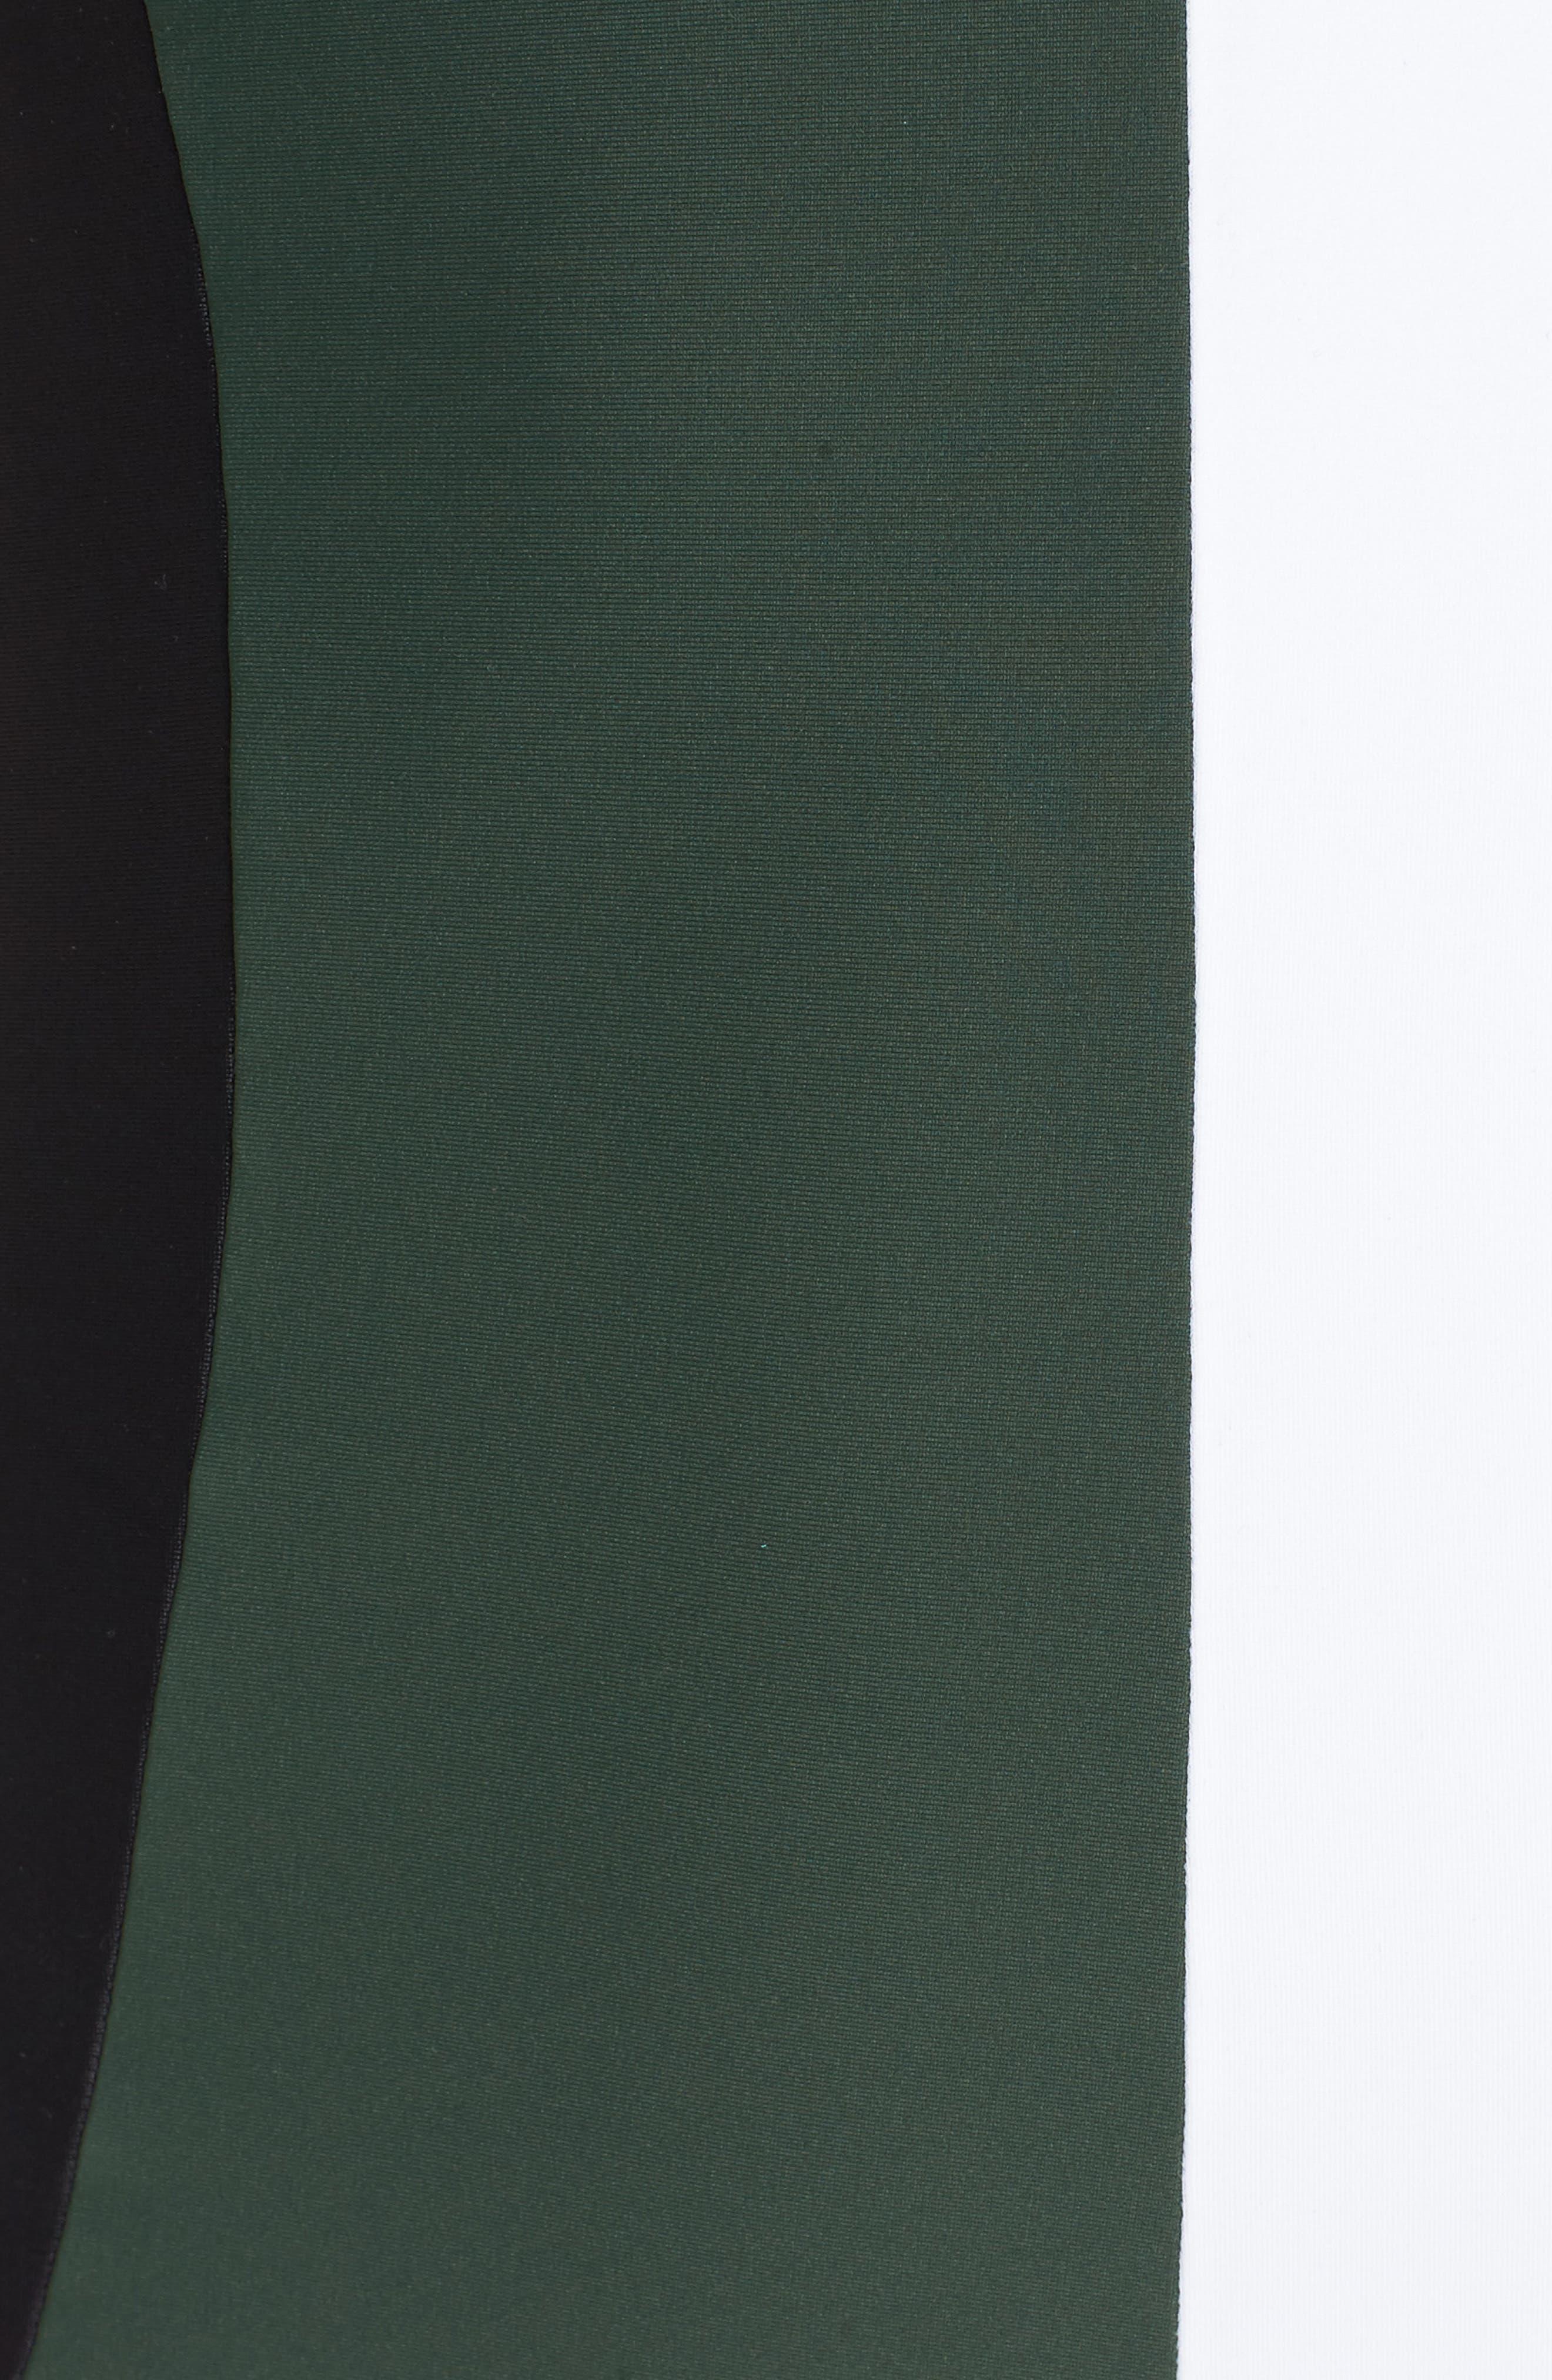 Farrah Colorblock One-Piece Swimsuit,                             Alternate thumbnail 5, color,                             Army